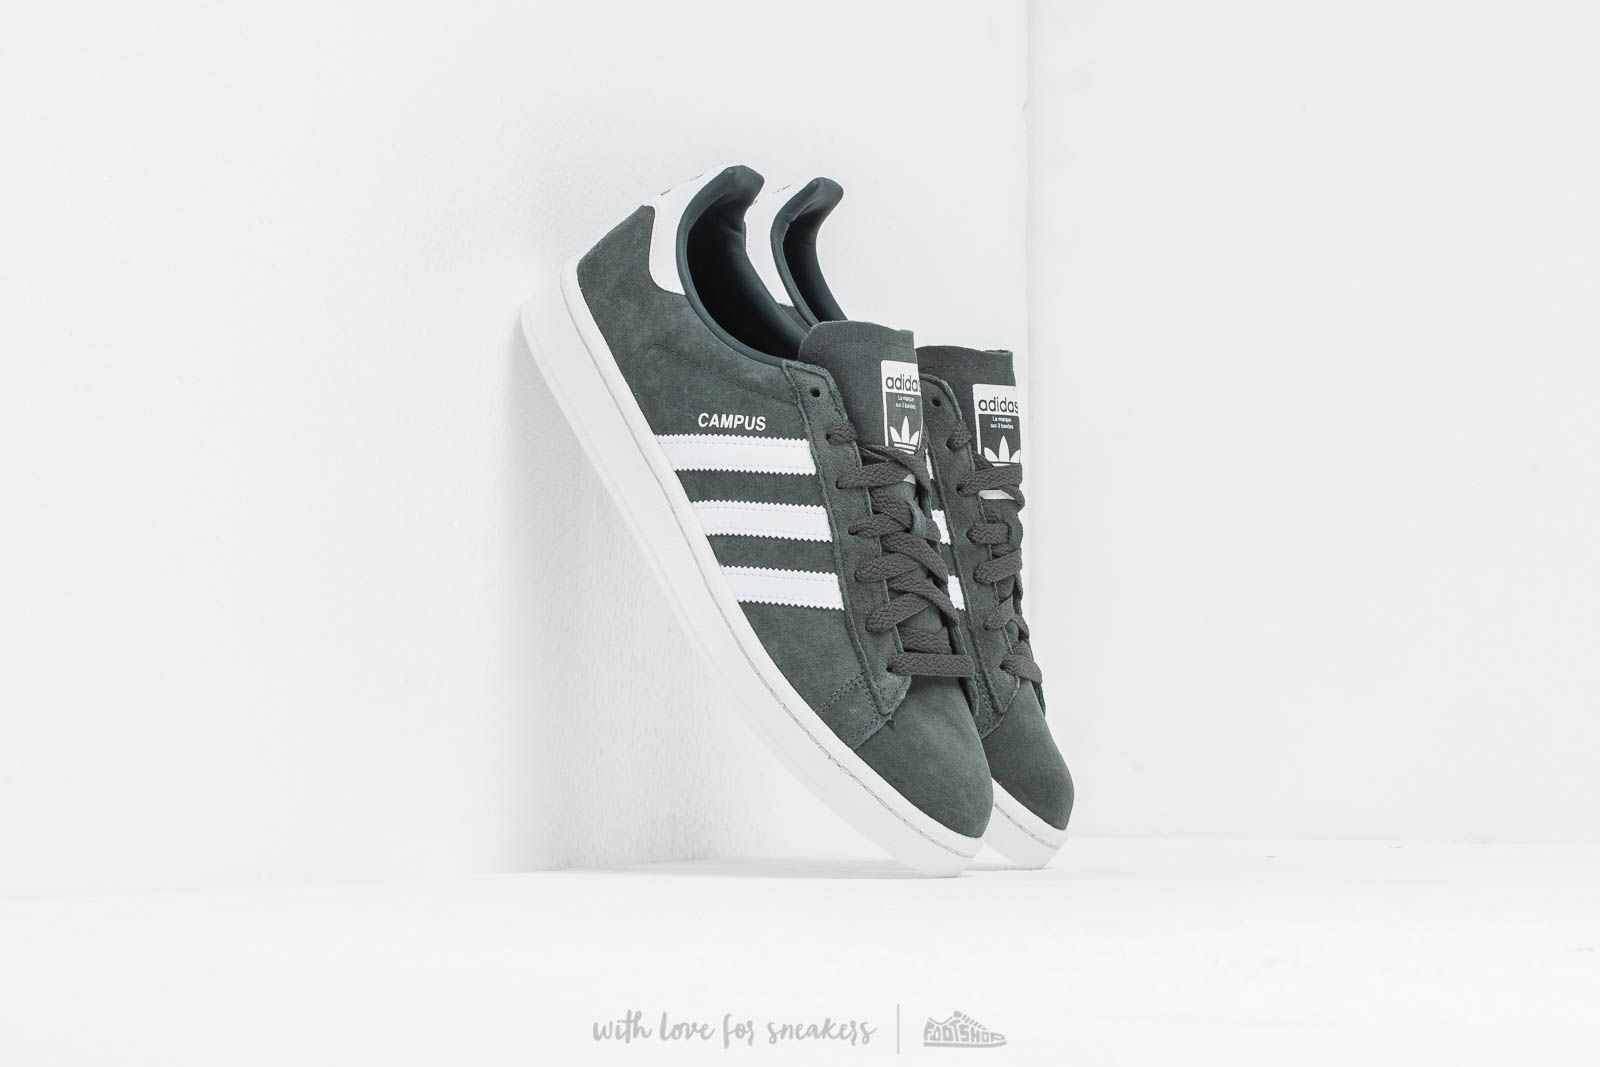 Pánské tenisky a boty adidas Campus Legend Ivy/ Ftw White/ Crystal White